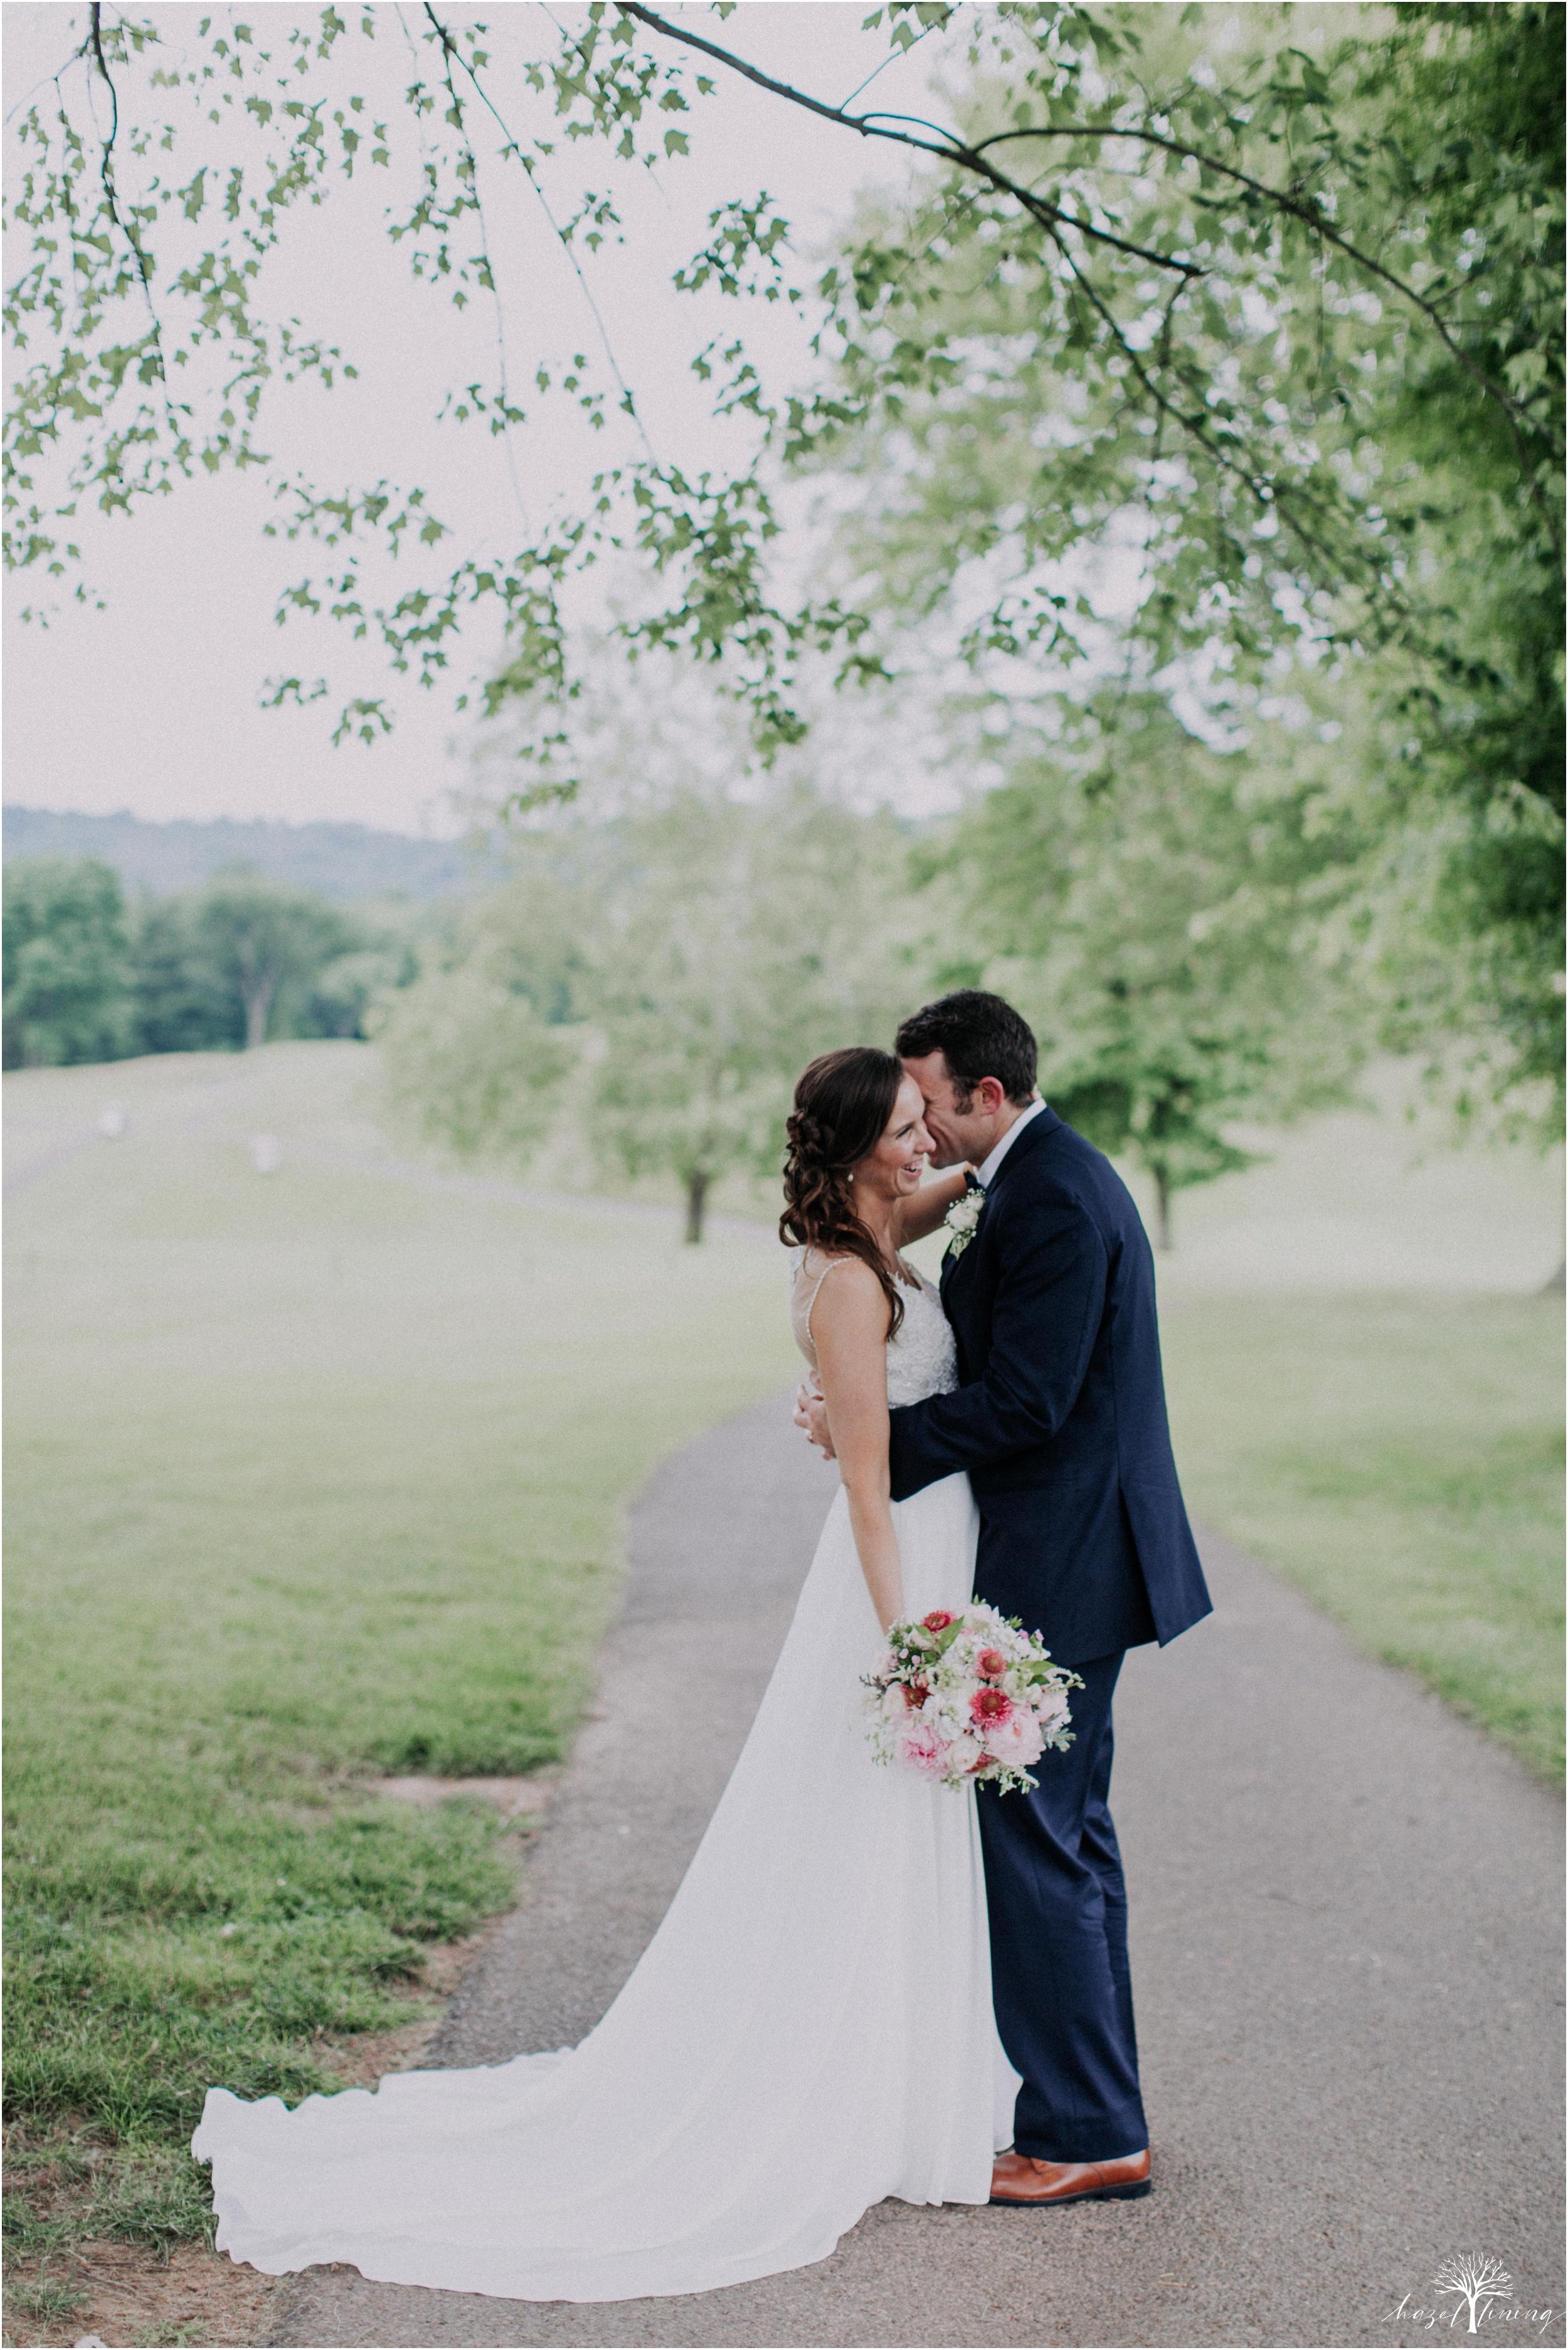 hazel-lining-travel-wedding-elopement-photography_0090.jpg